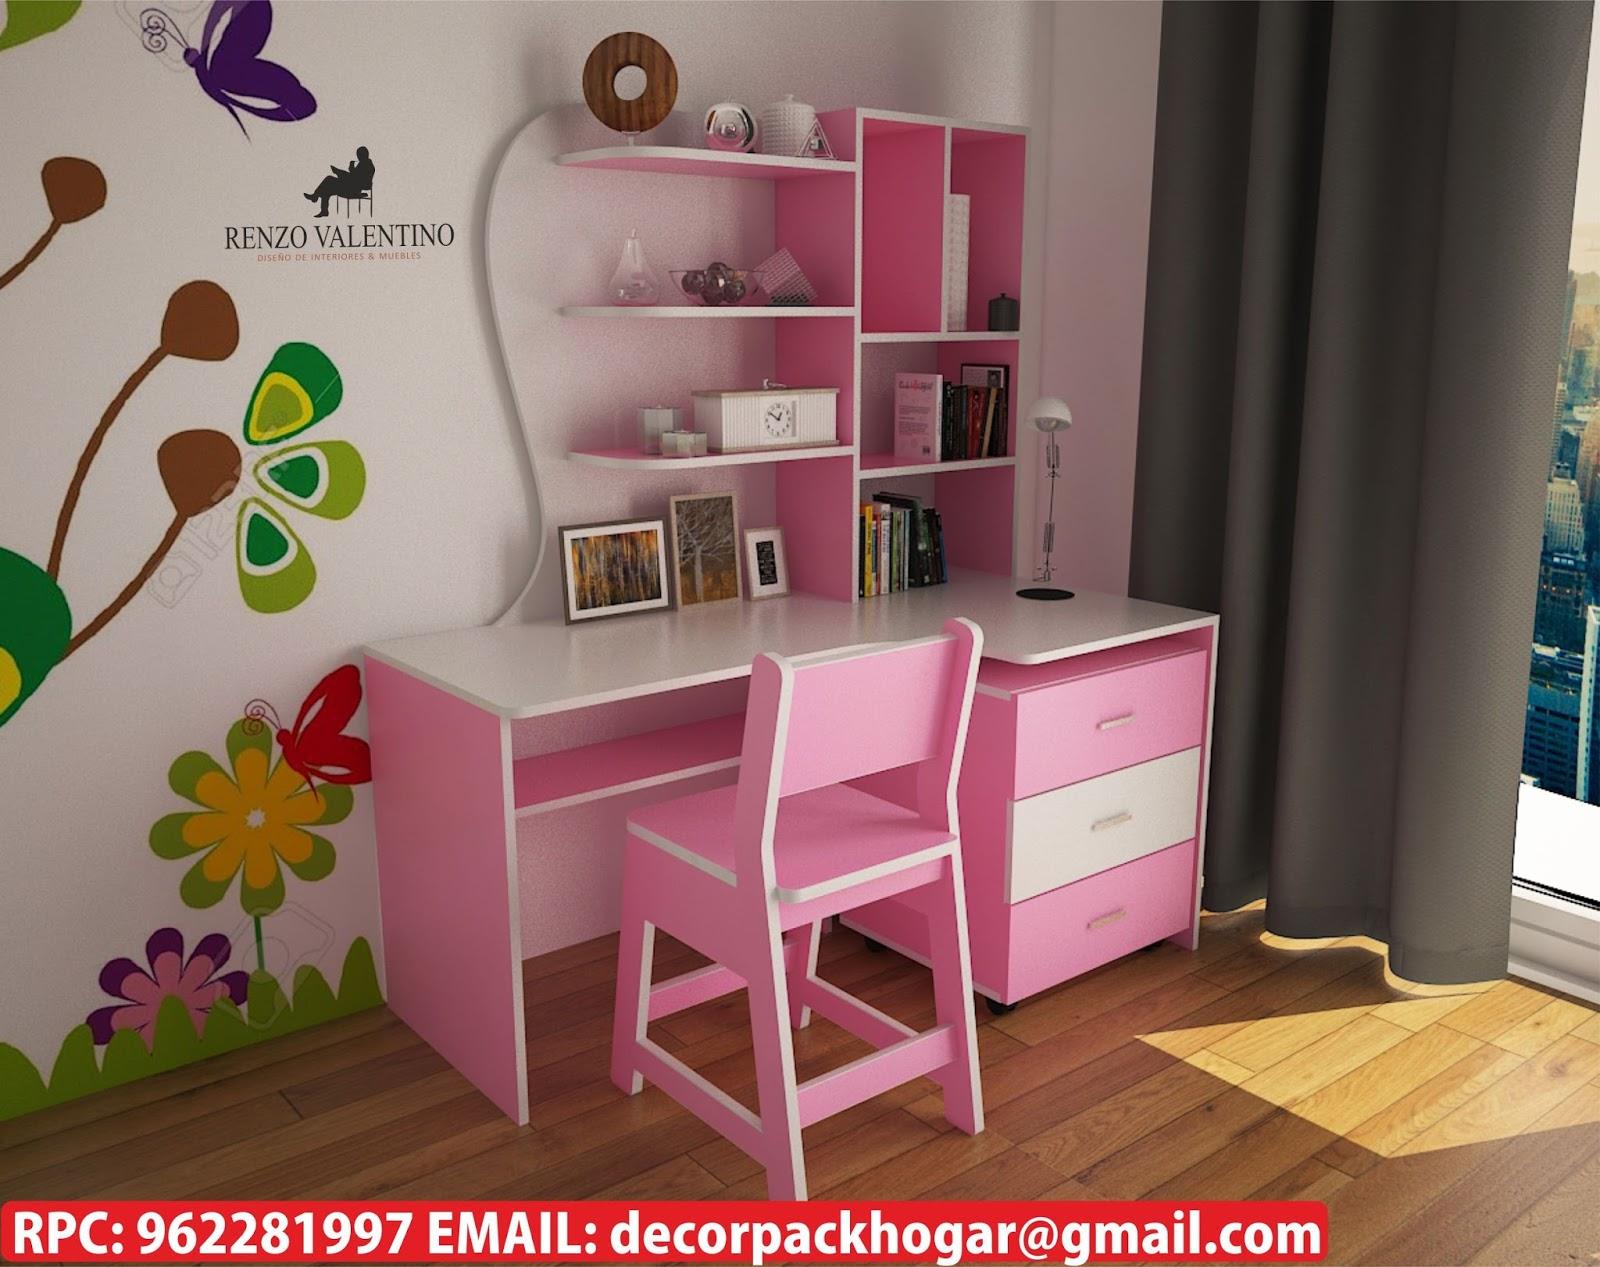 Dise os fabricacion de closet cocina y muebles de oficina for Roperos para cuartos de ninas